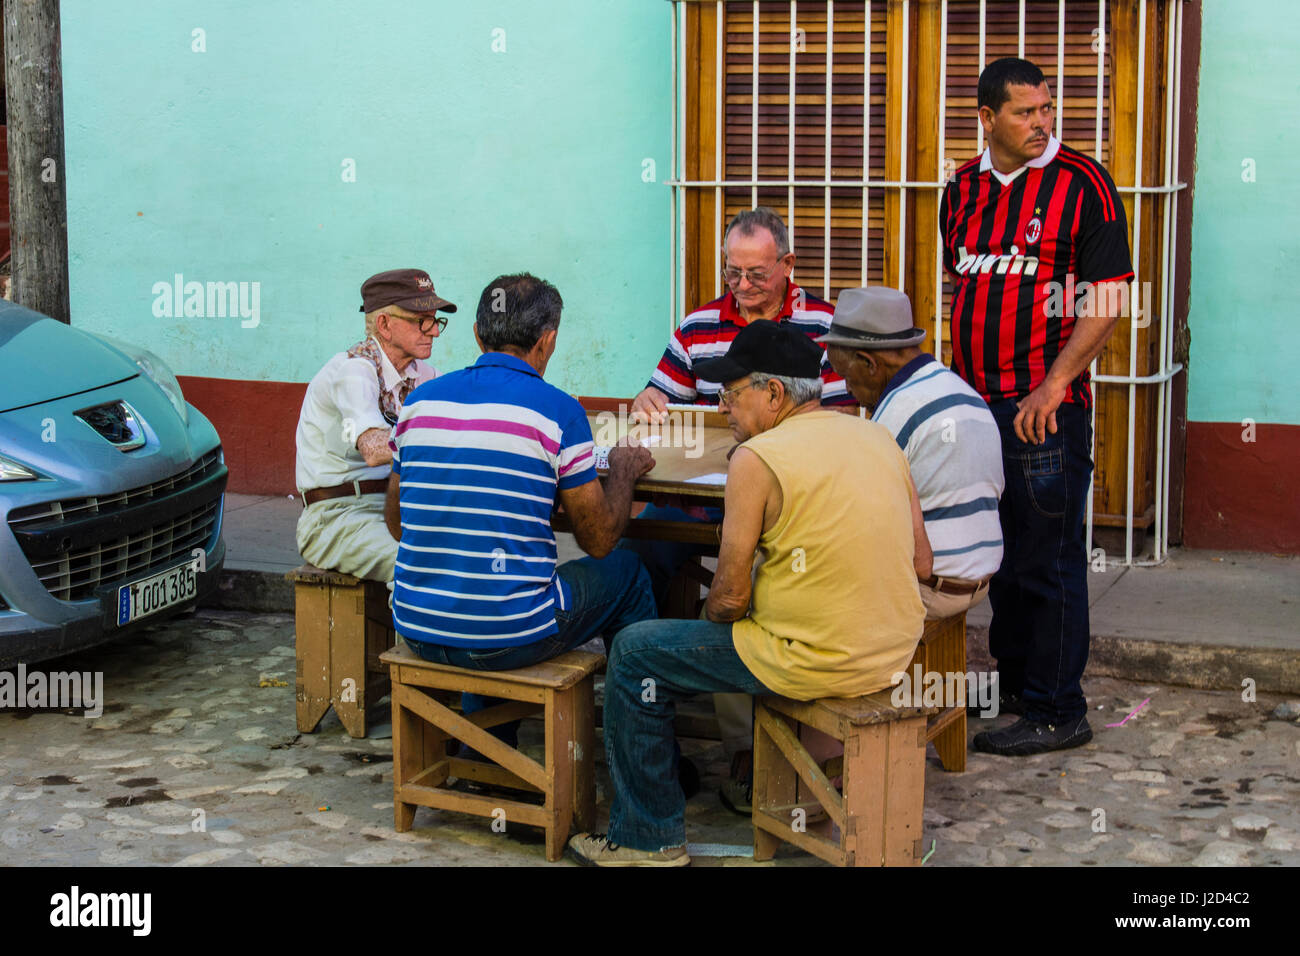 Cuba, Sancti Spiritus Province, Trinidad. Old men playing dominos. - Stock Image